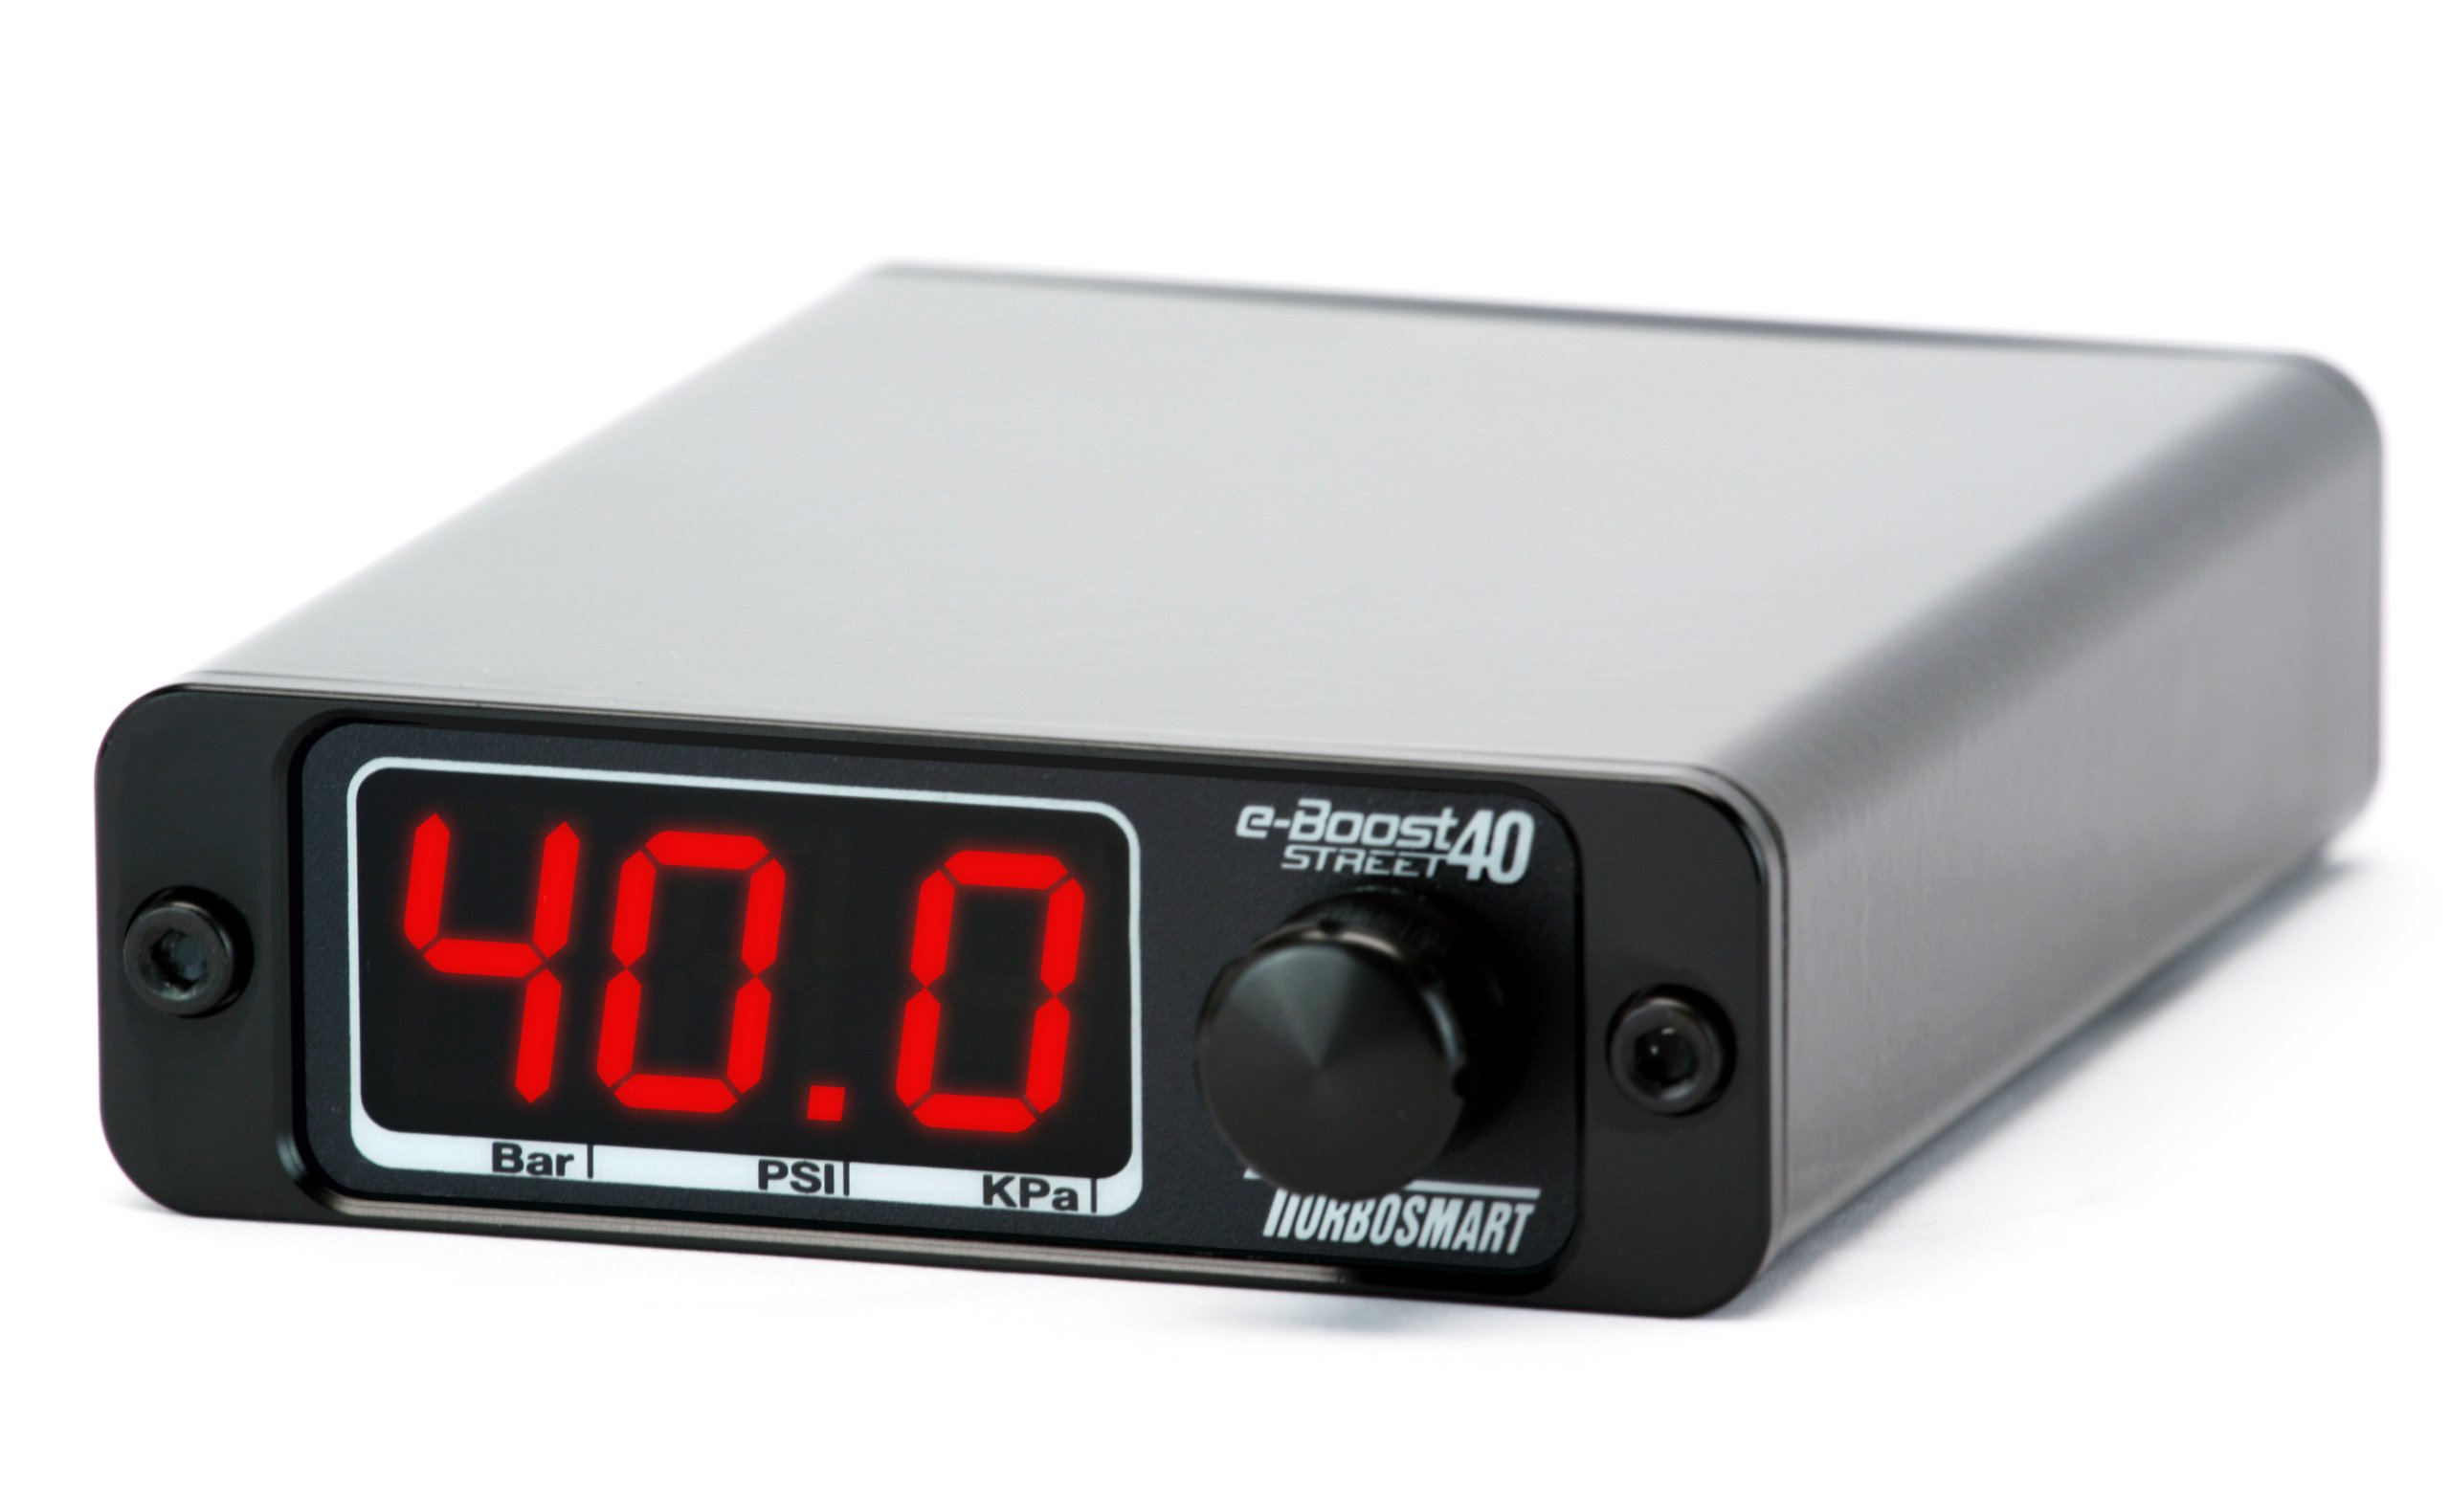 Turbosmart TS-0302-1002 e-Boost 40 PSI STREET Boost Controller by Turbosmart